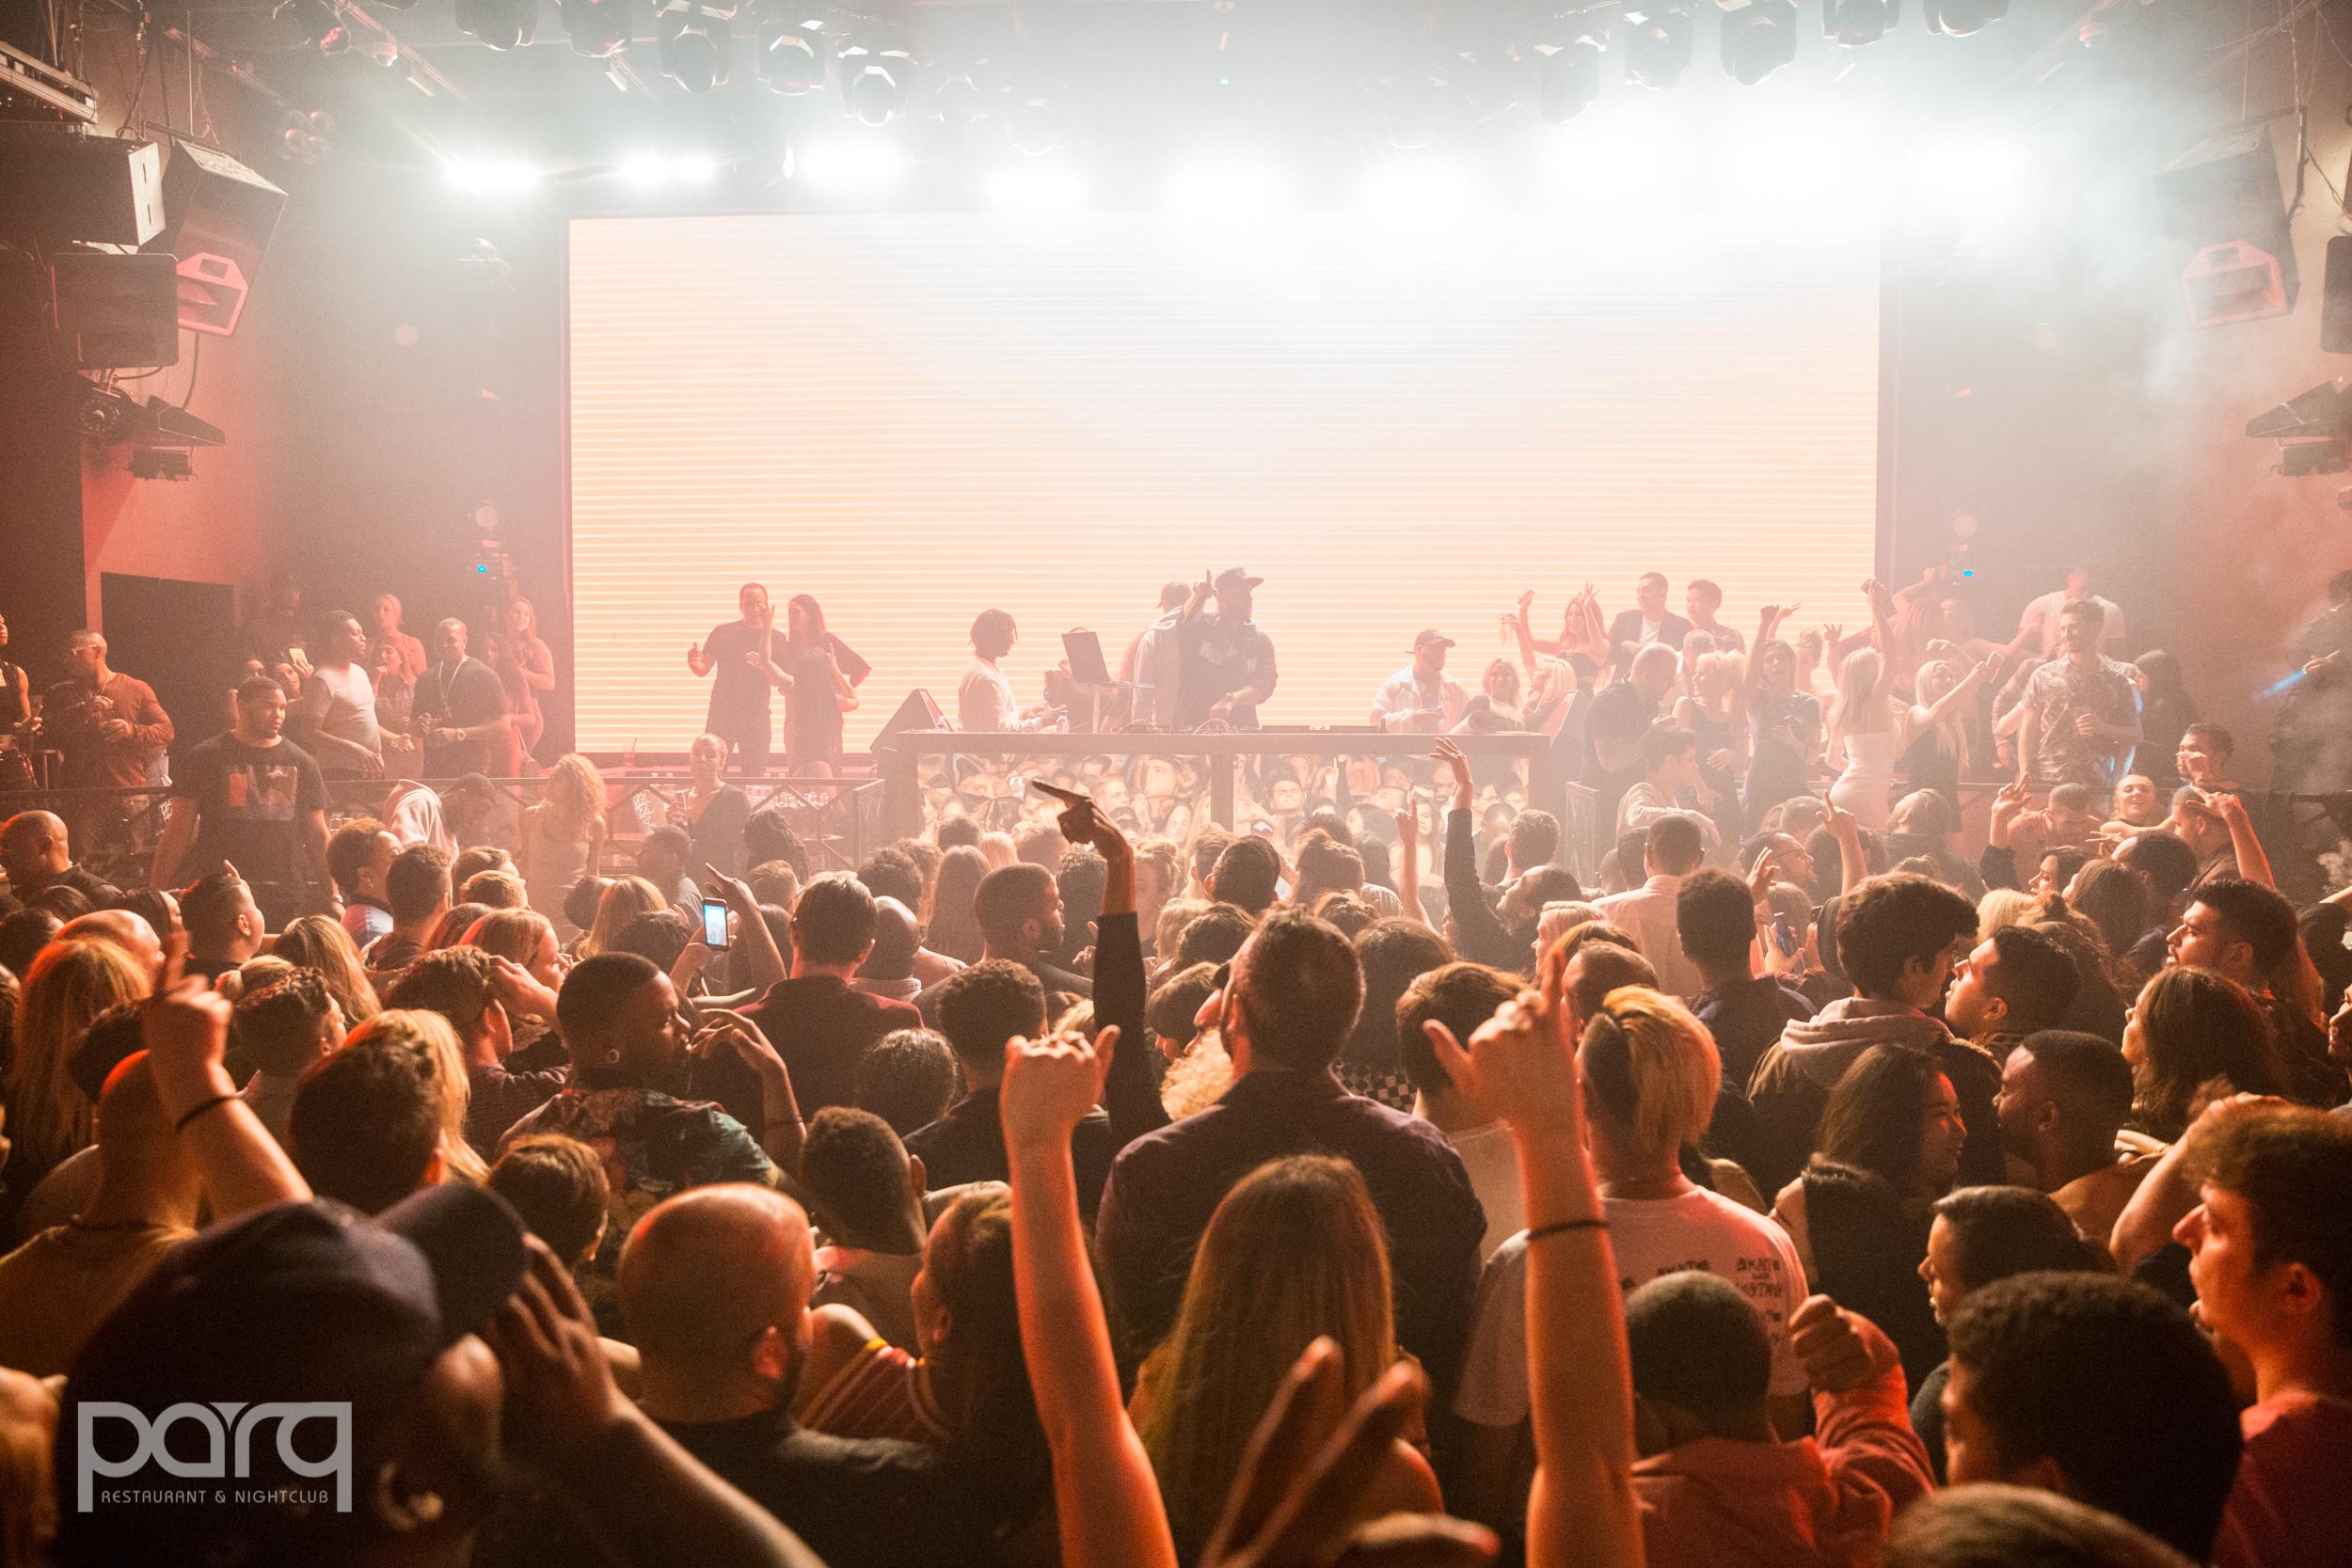 02.18.18 Parq - DJ Drama-21.jpg